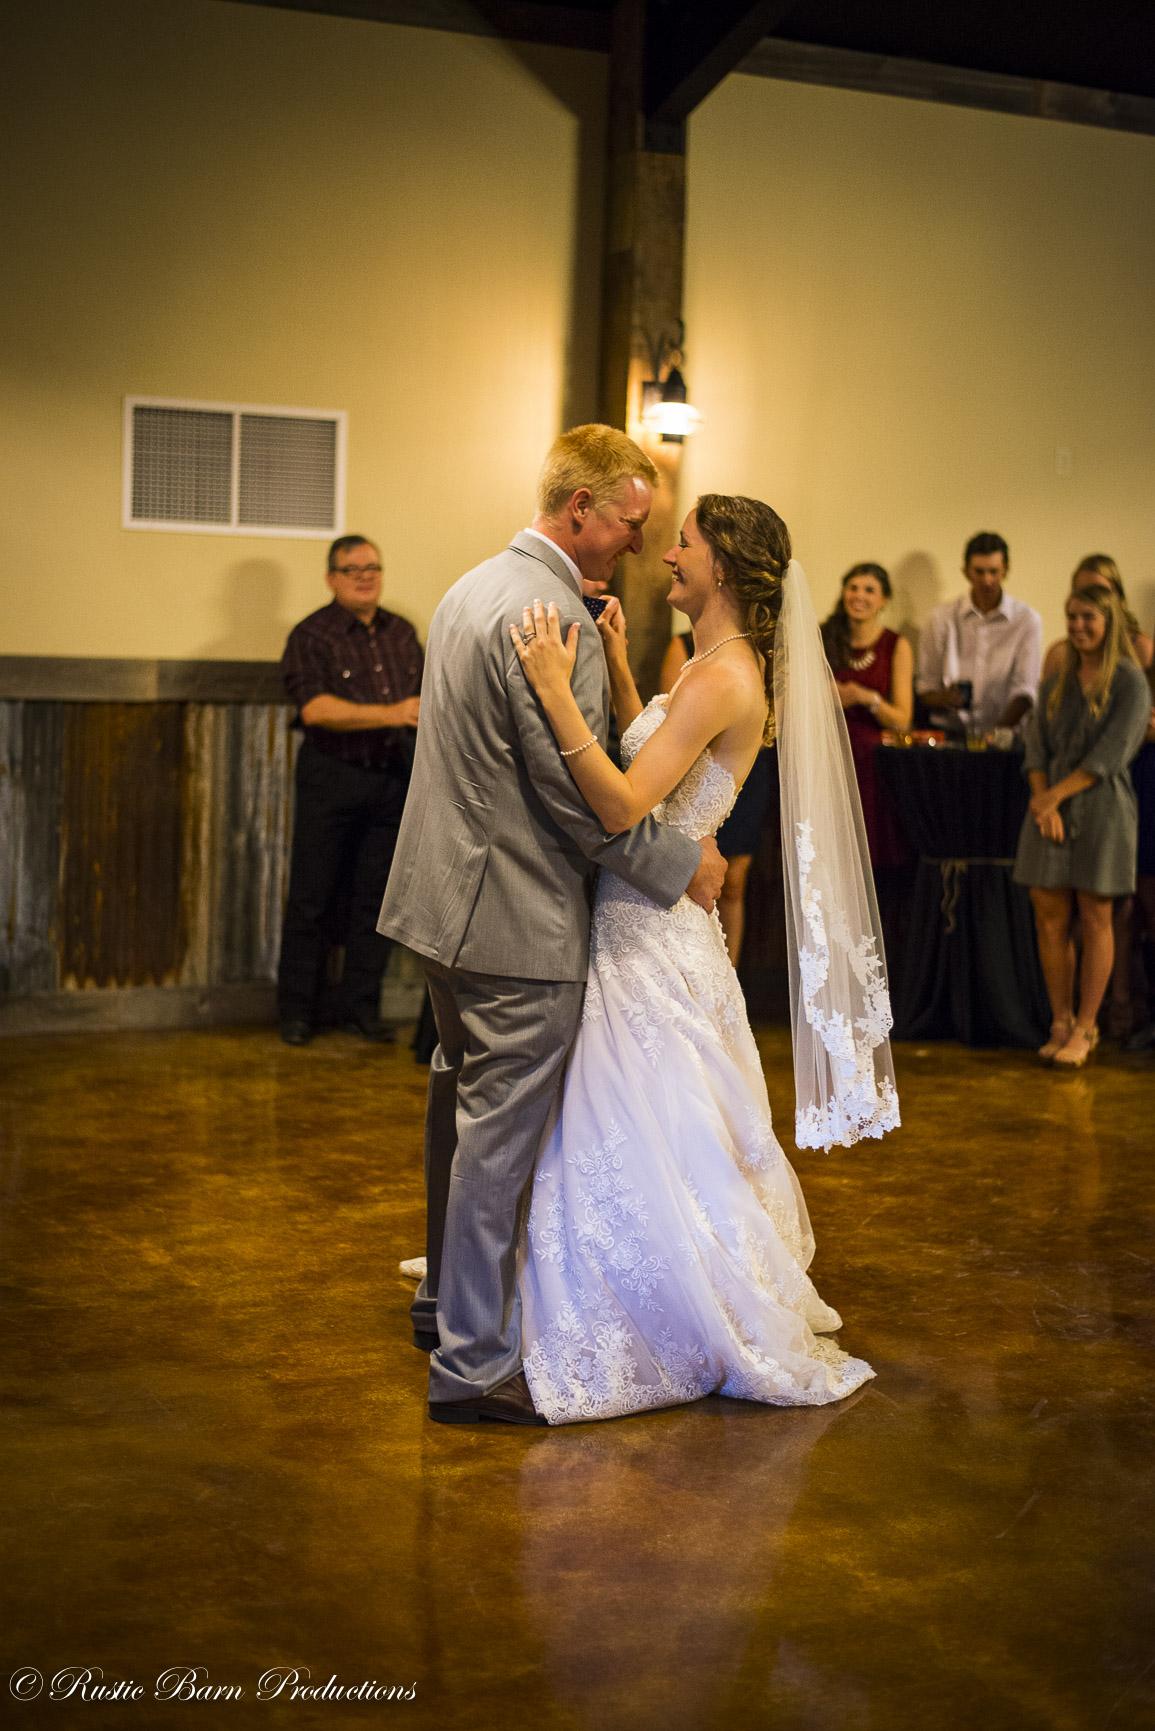 Shelby and Nates wedding-9524.jpg